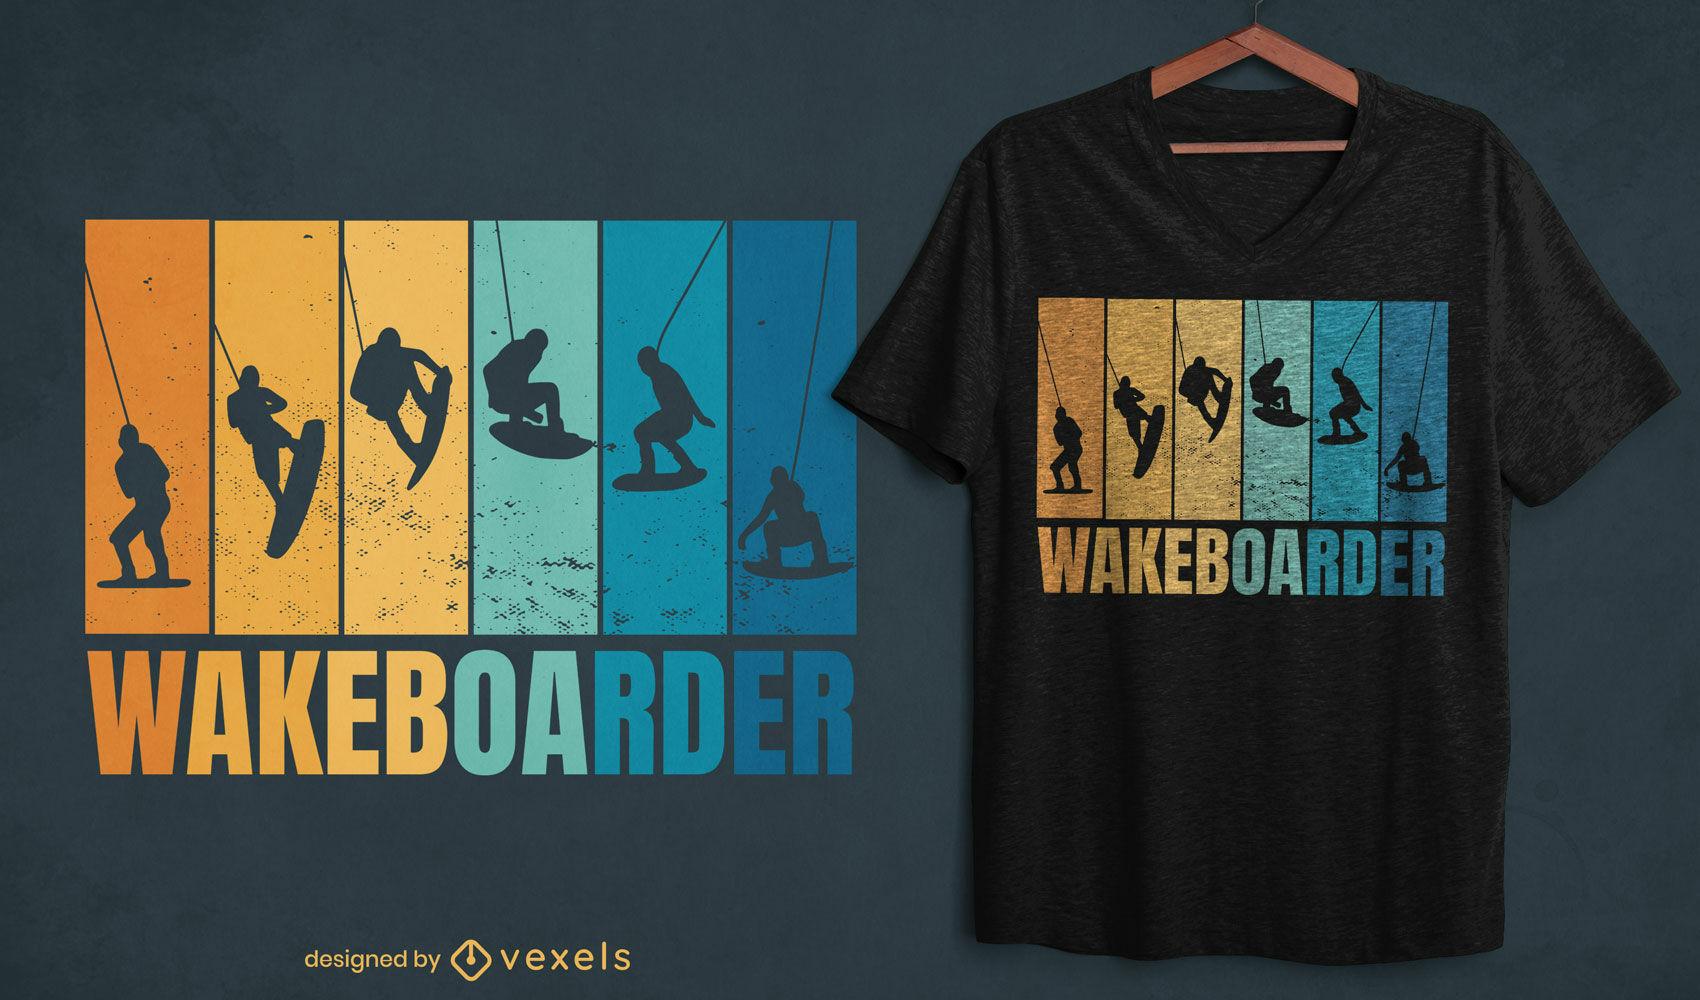 Projeto de camisetas retrô com silhuetas de wakeboard